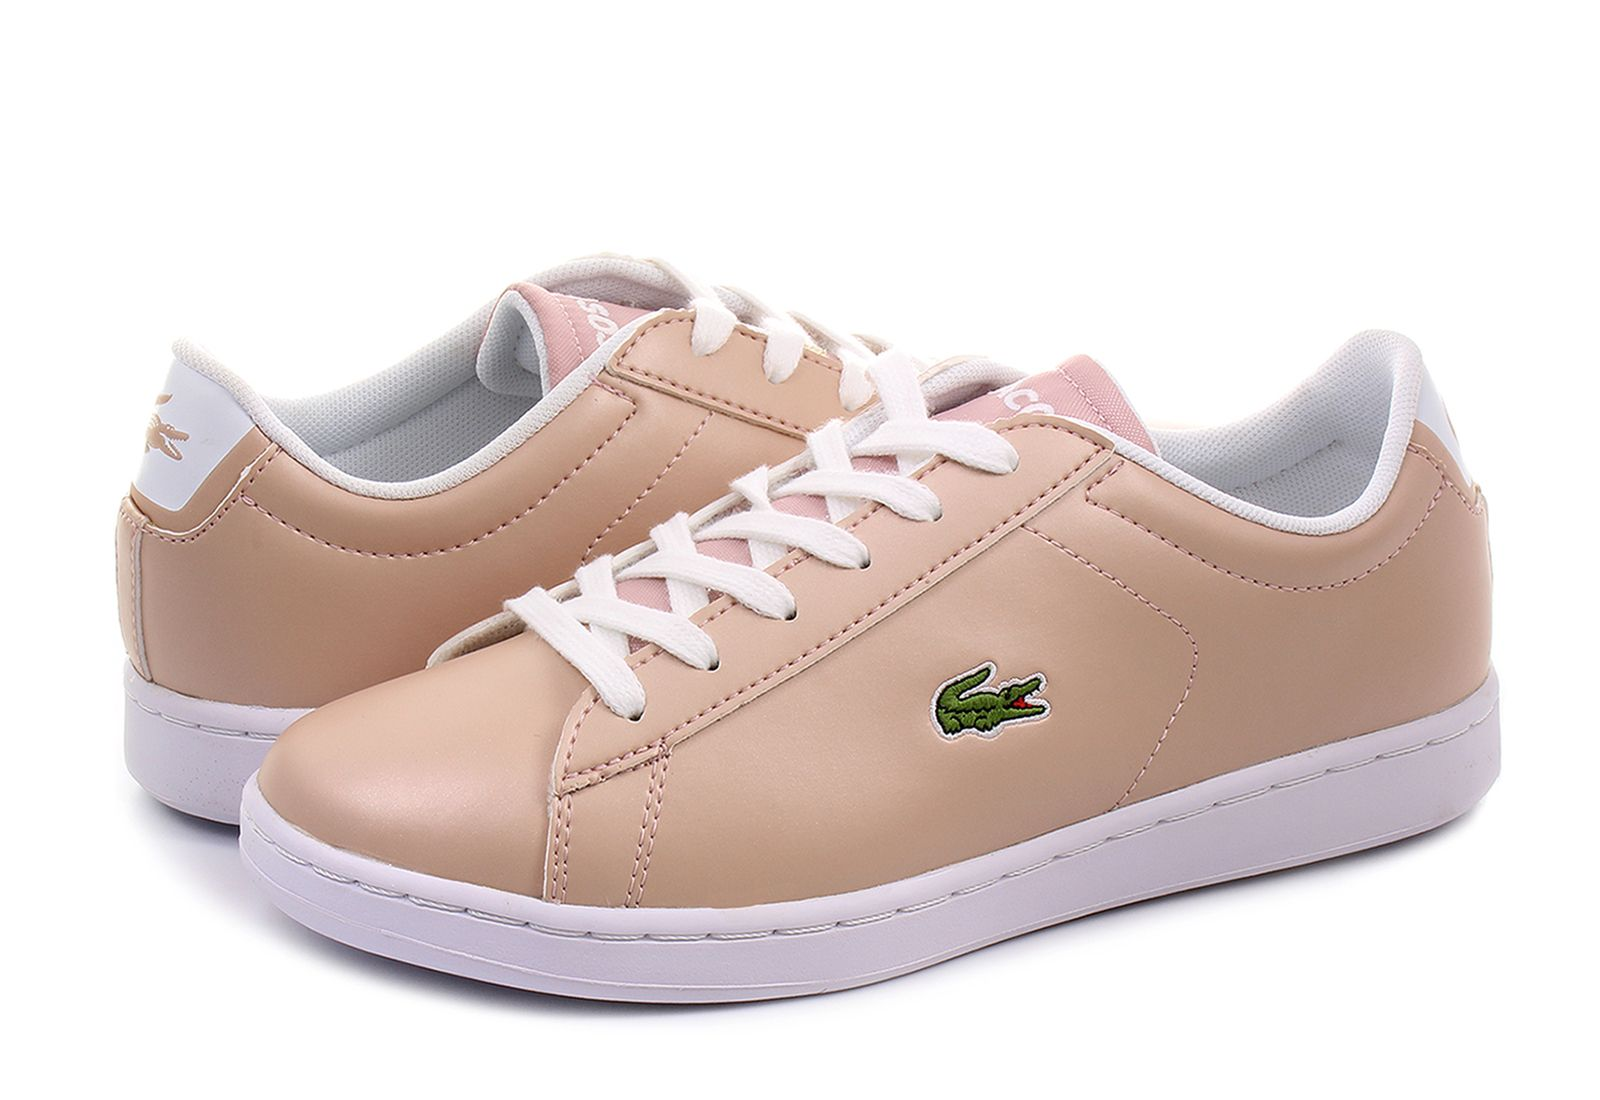 Lacoste Shoes - Carnaby Evo - 173SPJ0006-15J - Online shop for ... 0f17fd11ba